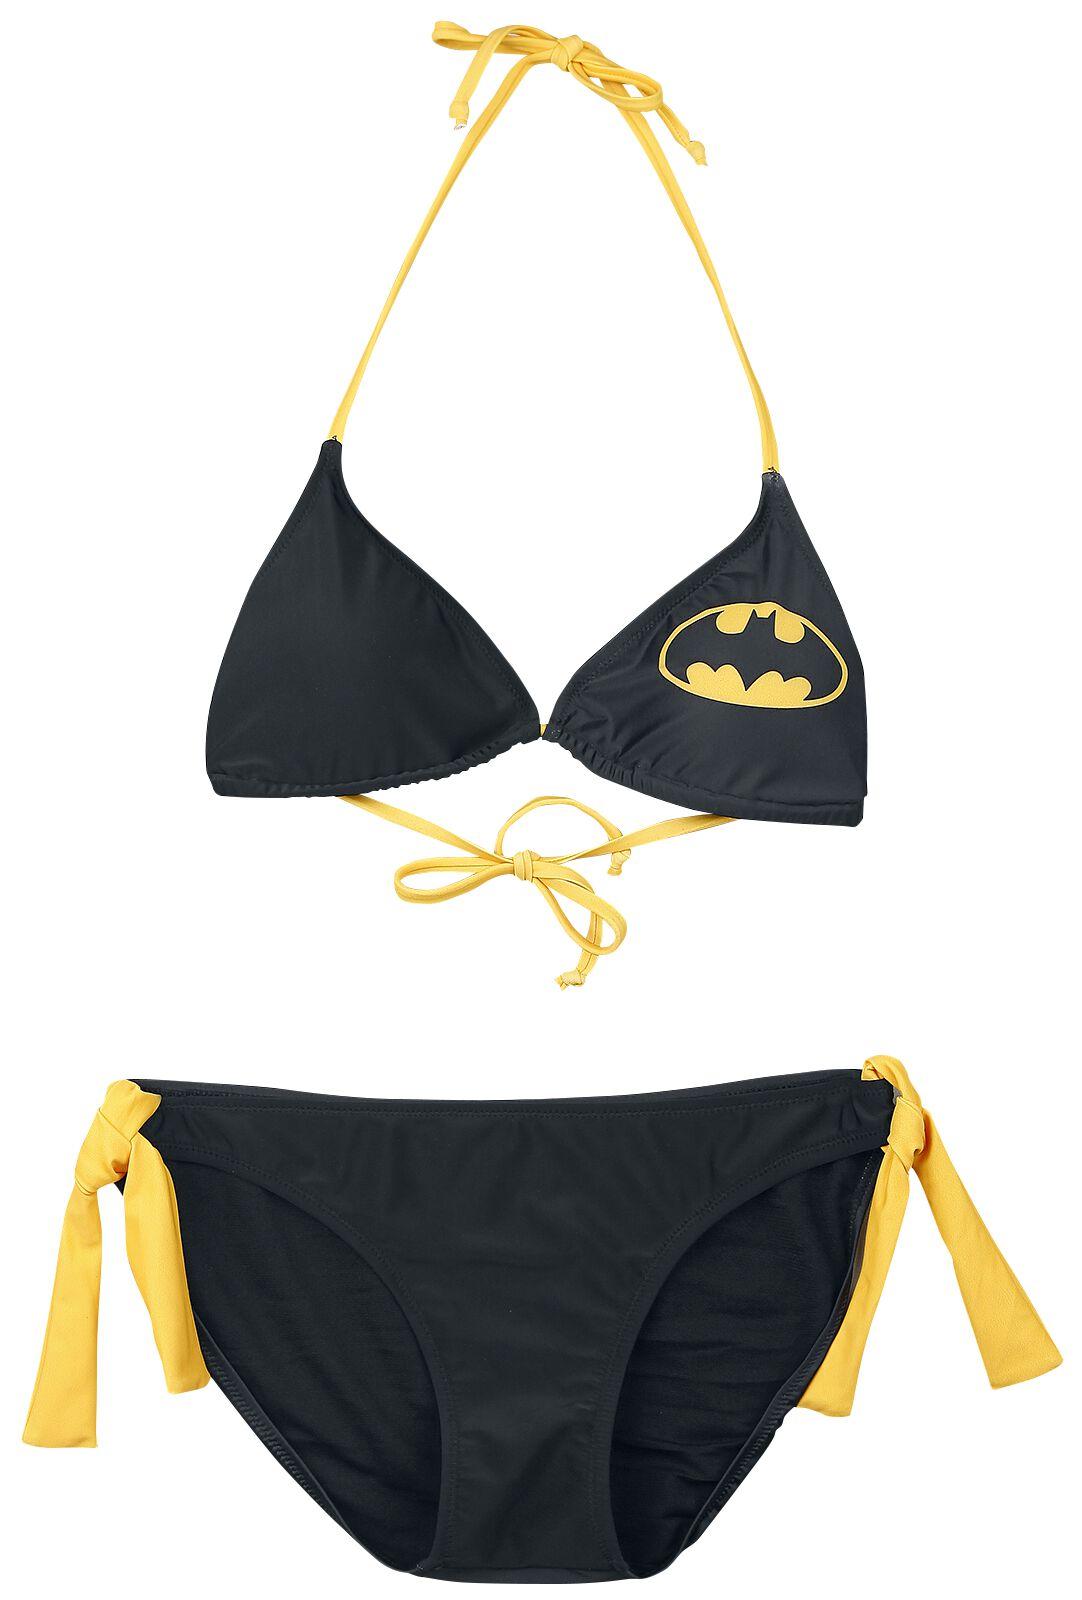 Image of   Batman Logo Bikini sort-gul